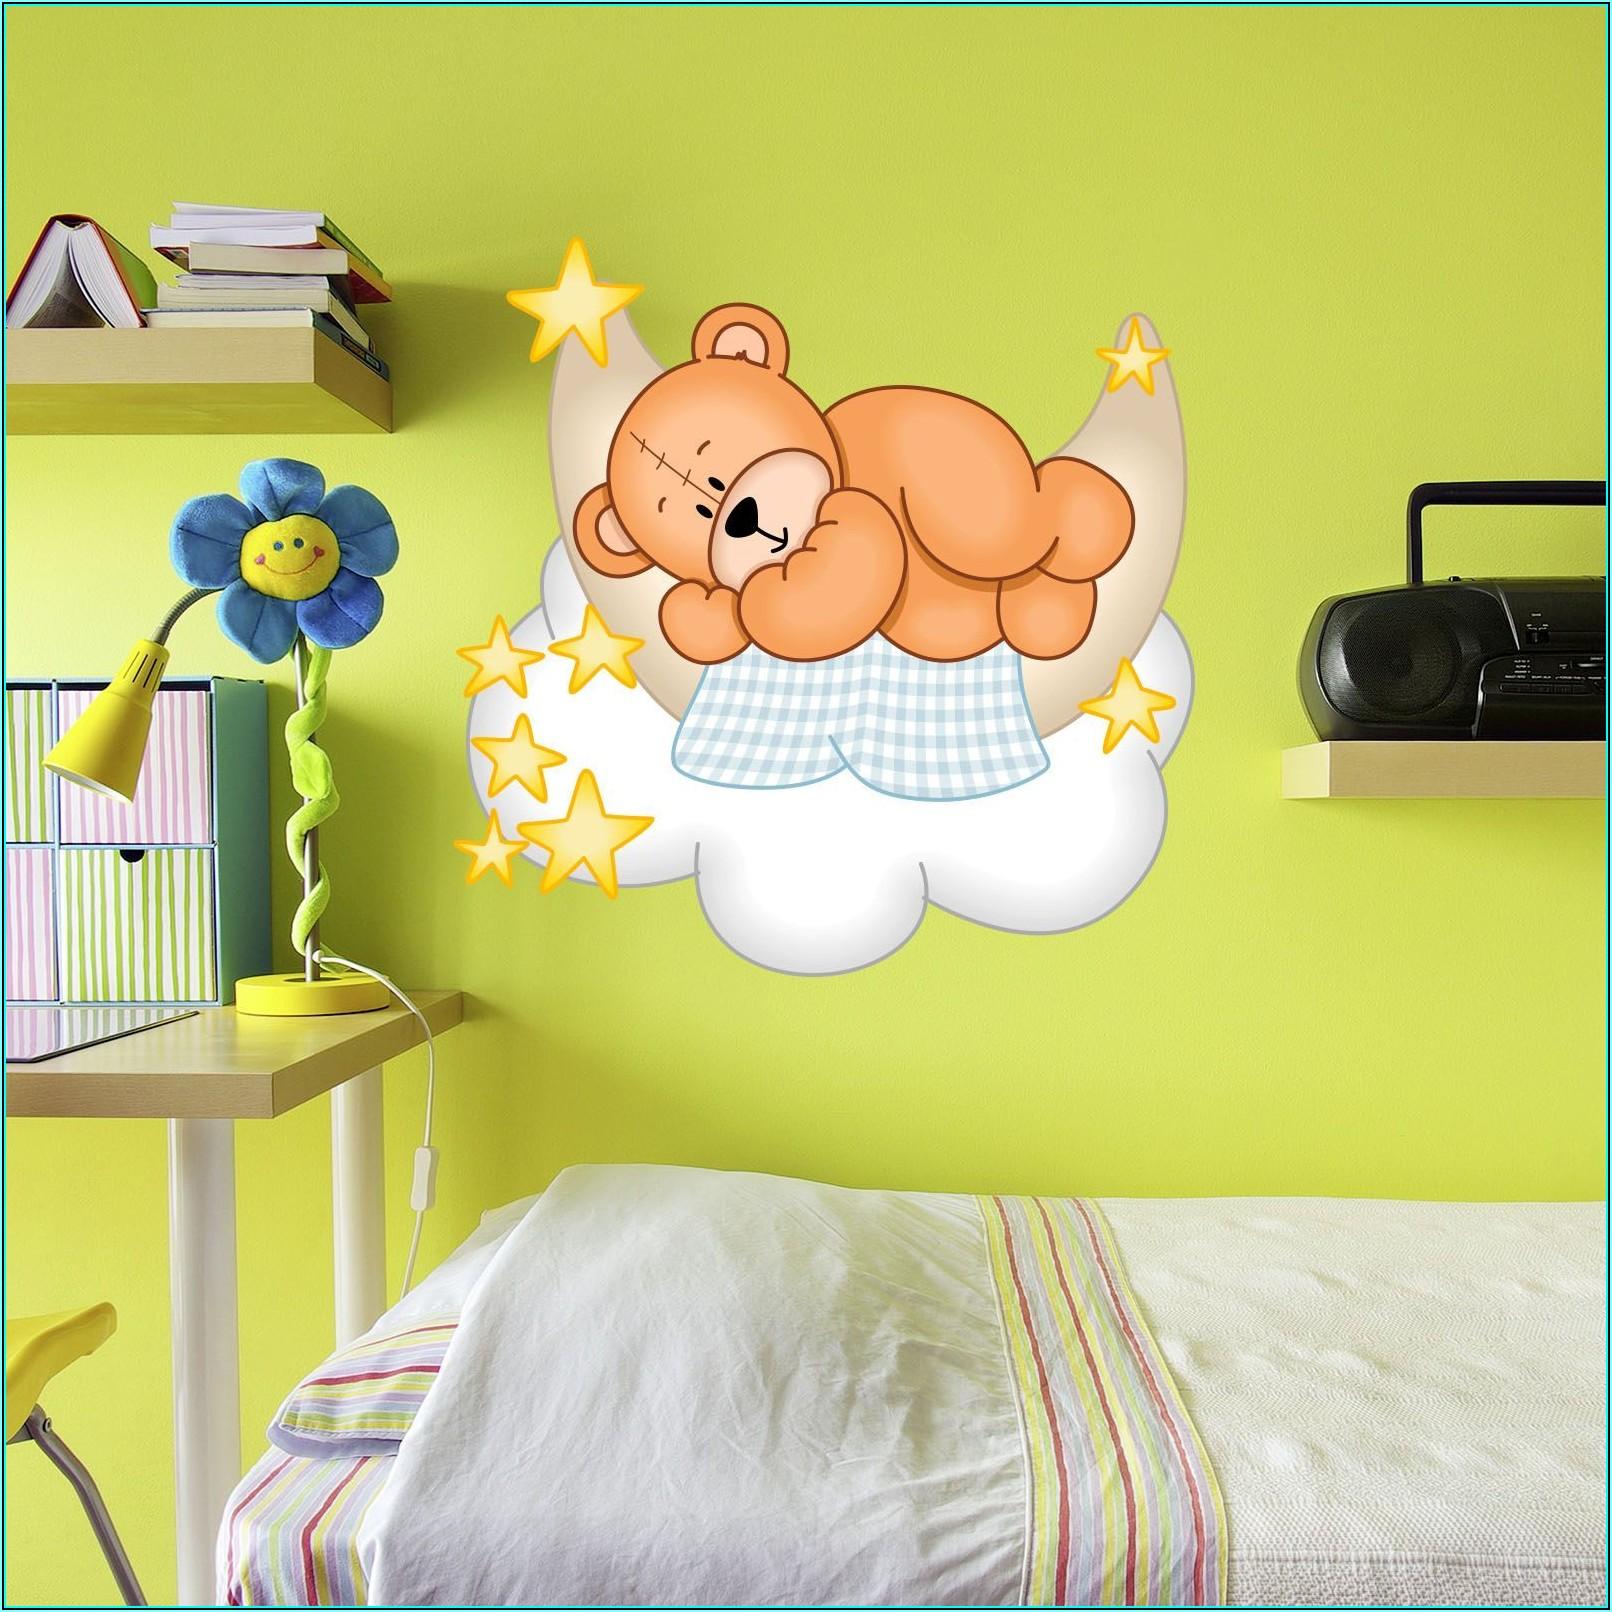 Wandtattoo Kinderzimmer Teddy